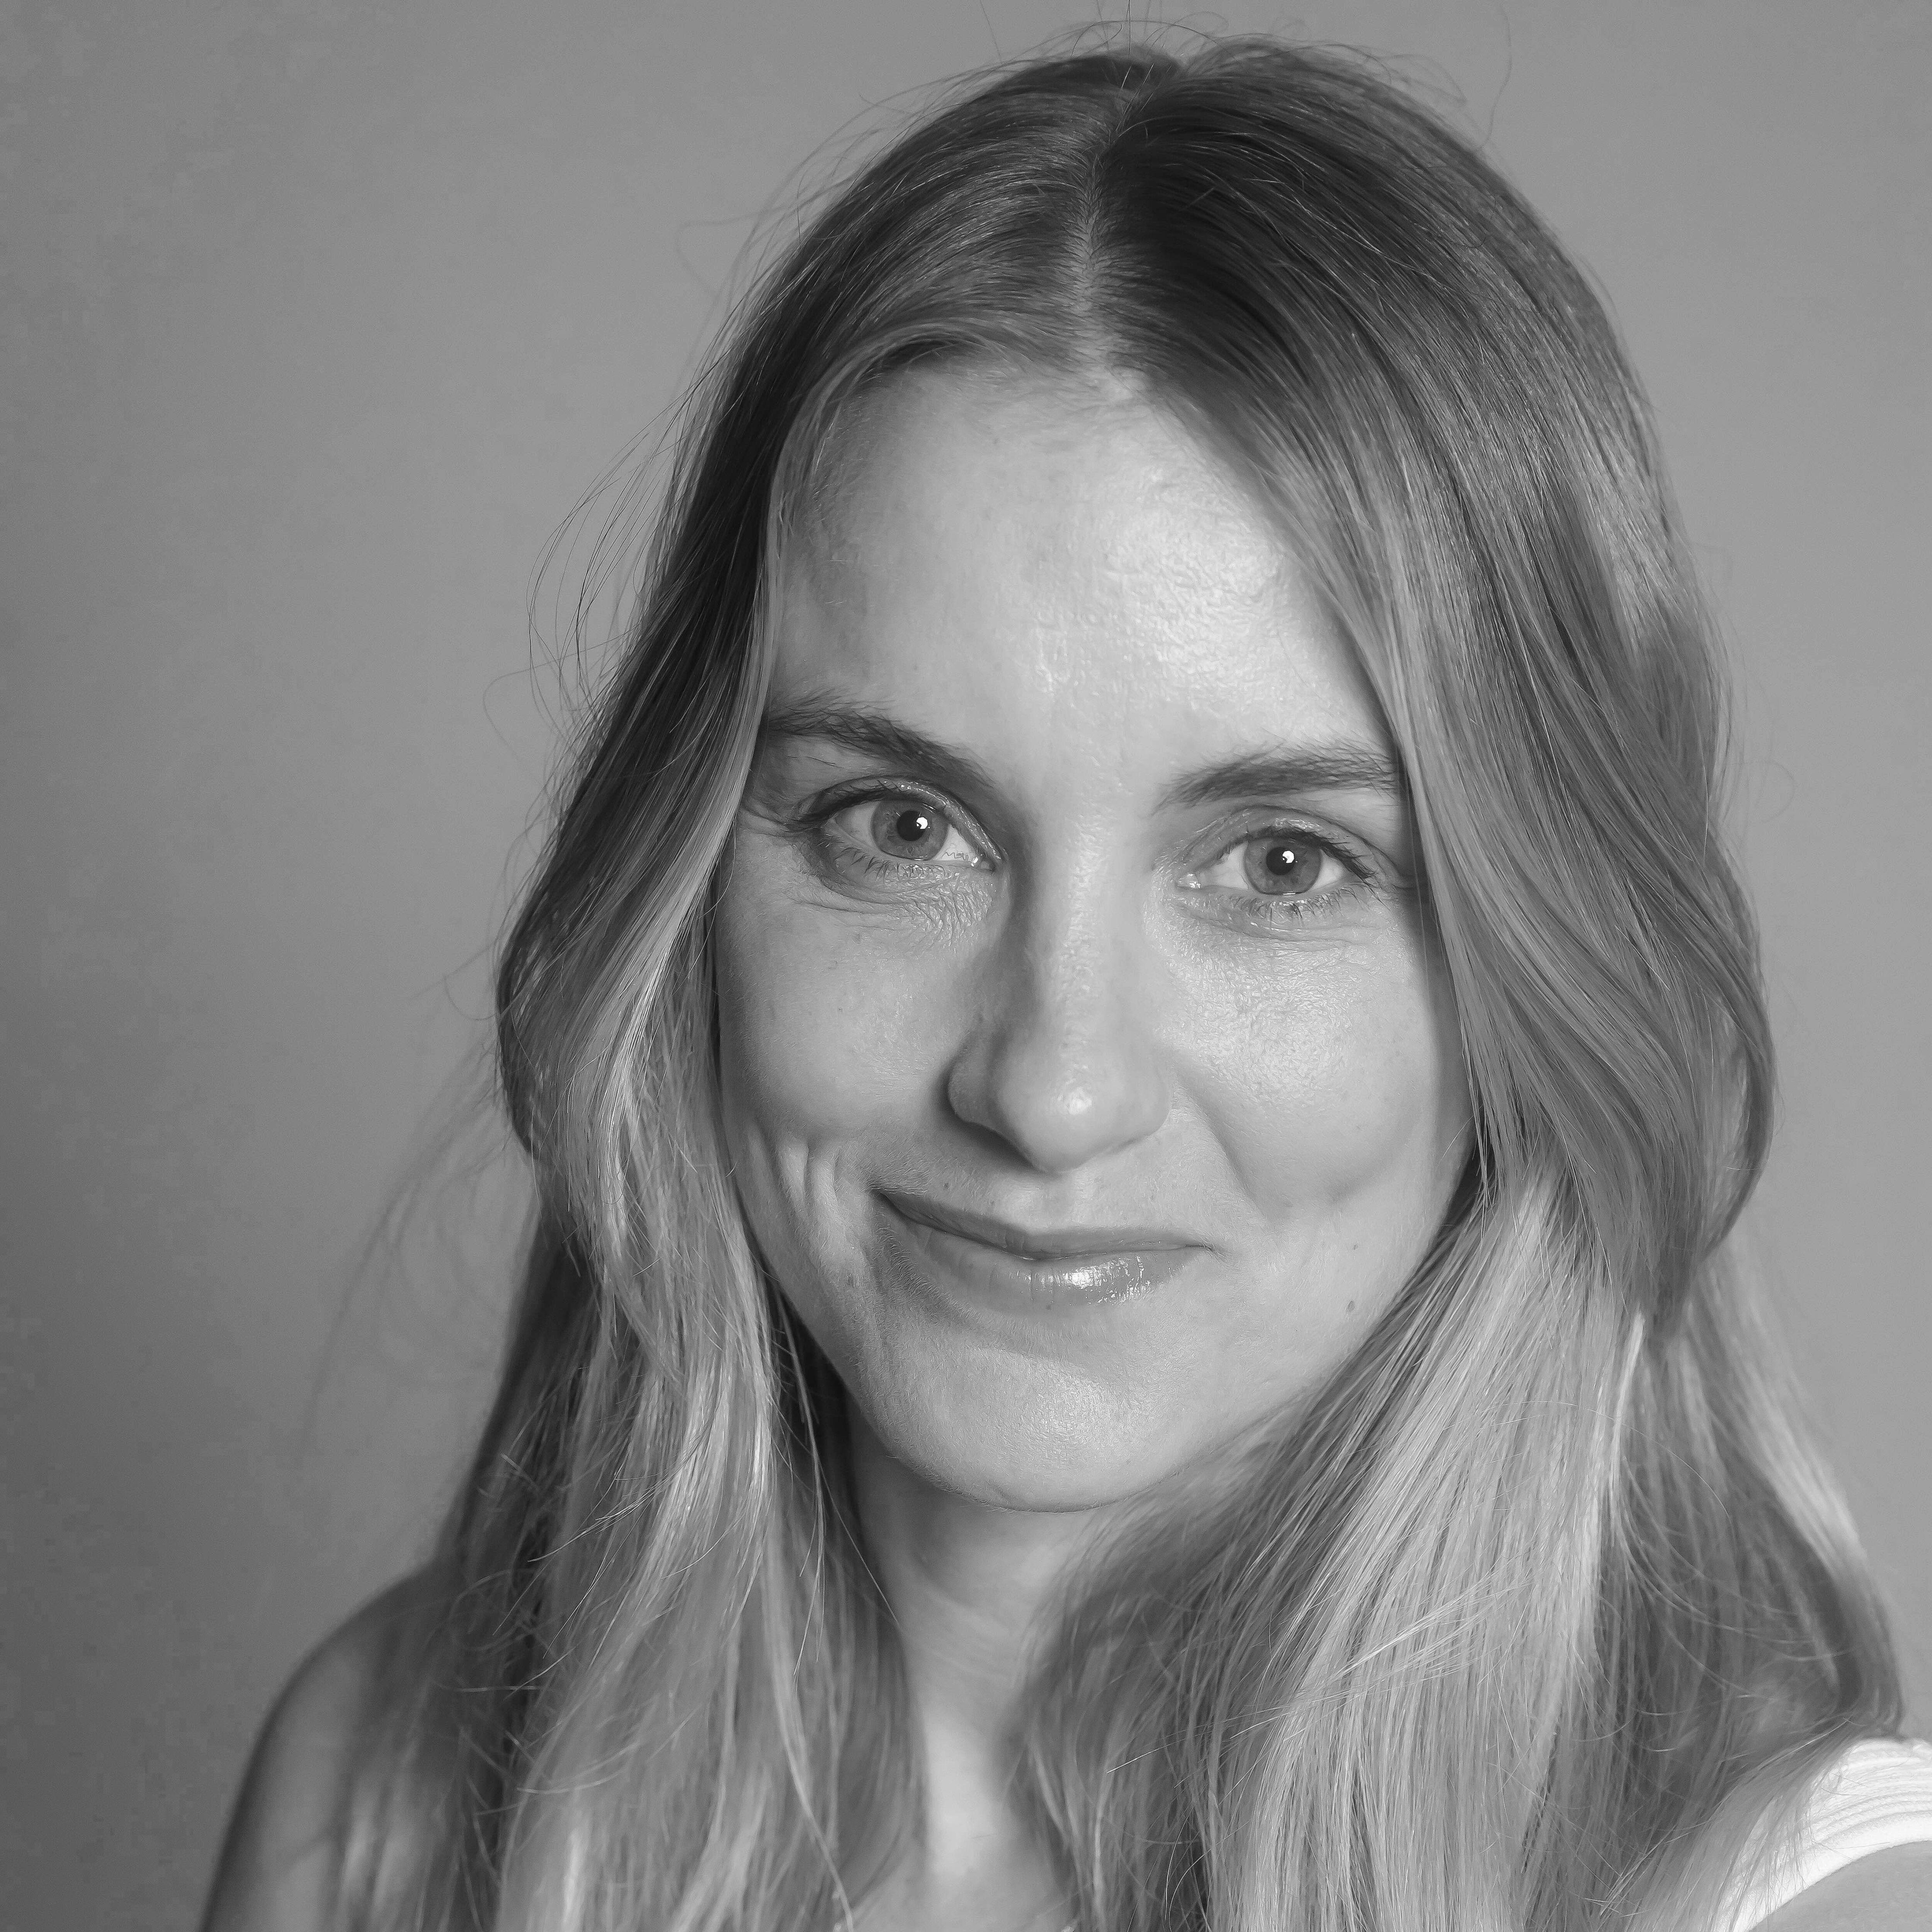 Sophie Hellyer